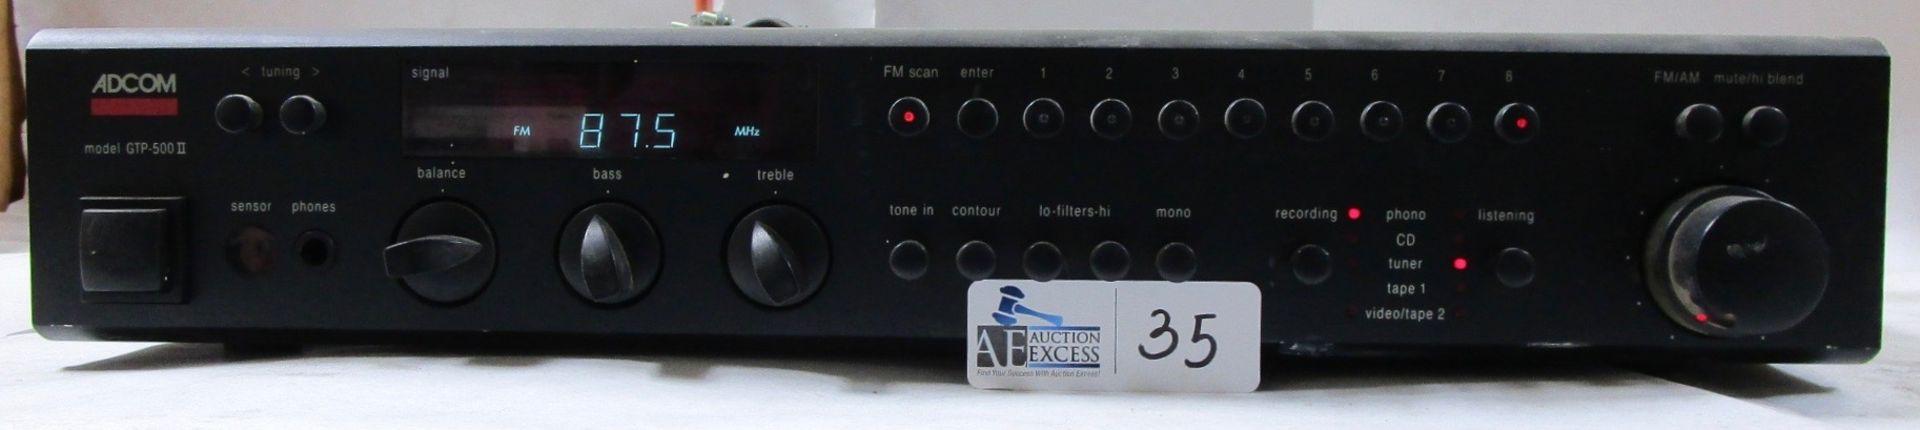 Lot 35 - ADCOM GTP-500 II